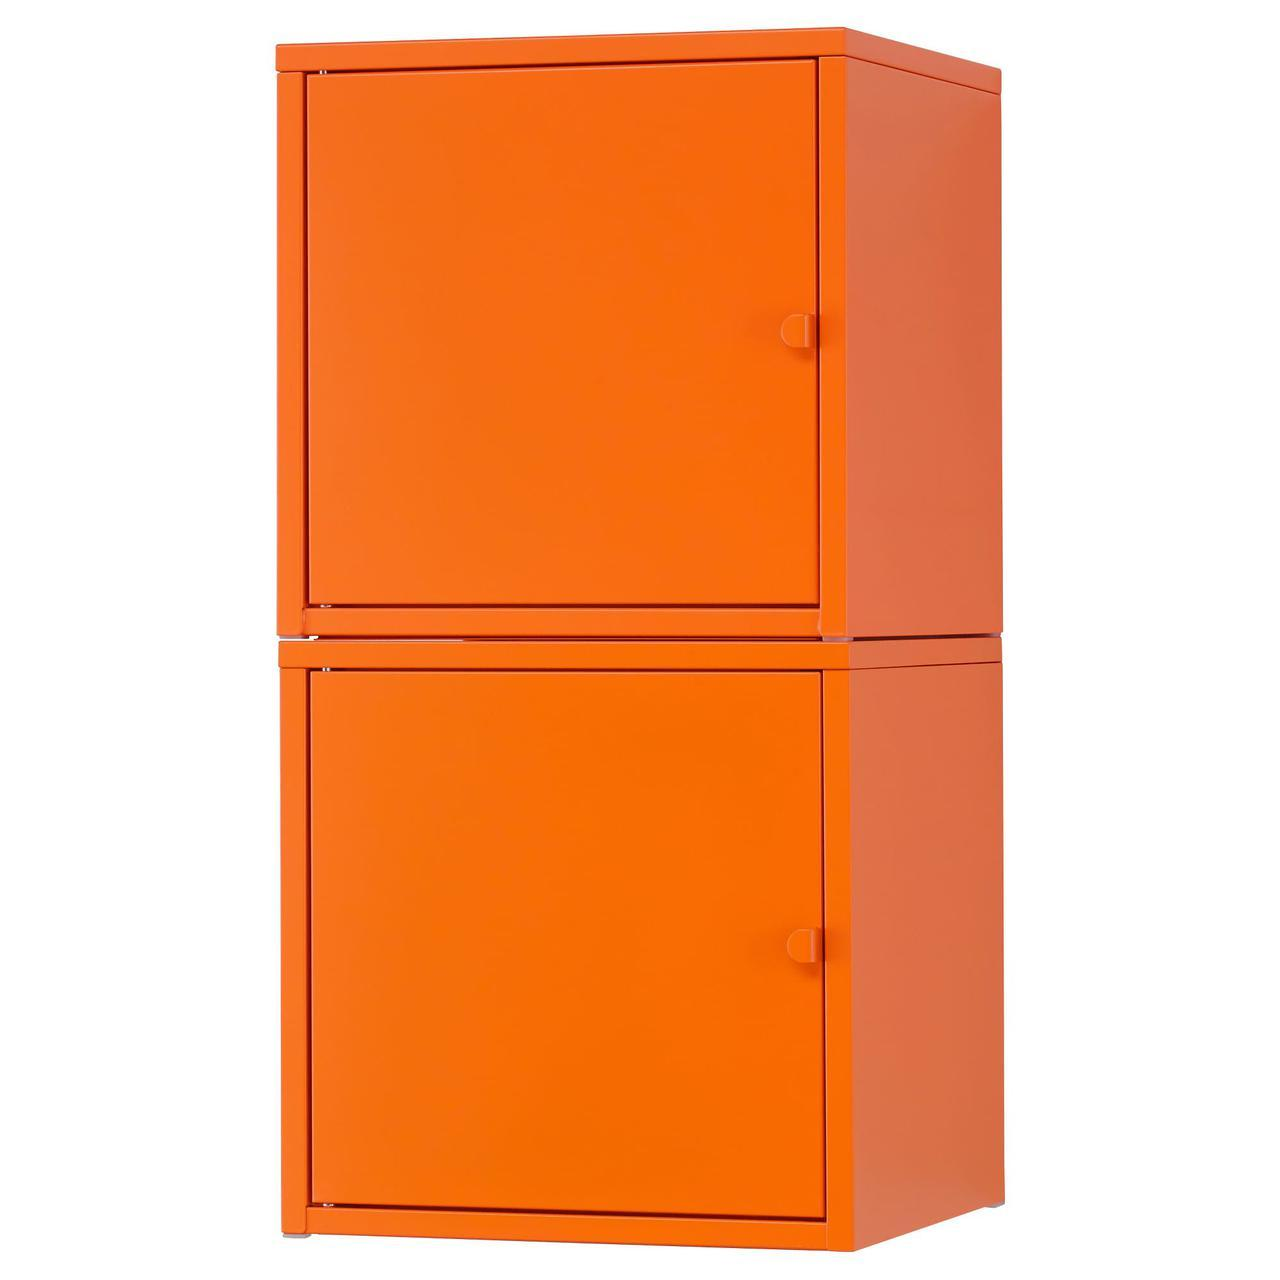 IKEA LIXHULT (291.615.92) Шкаф, , оранжевый